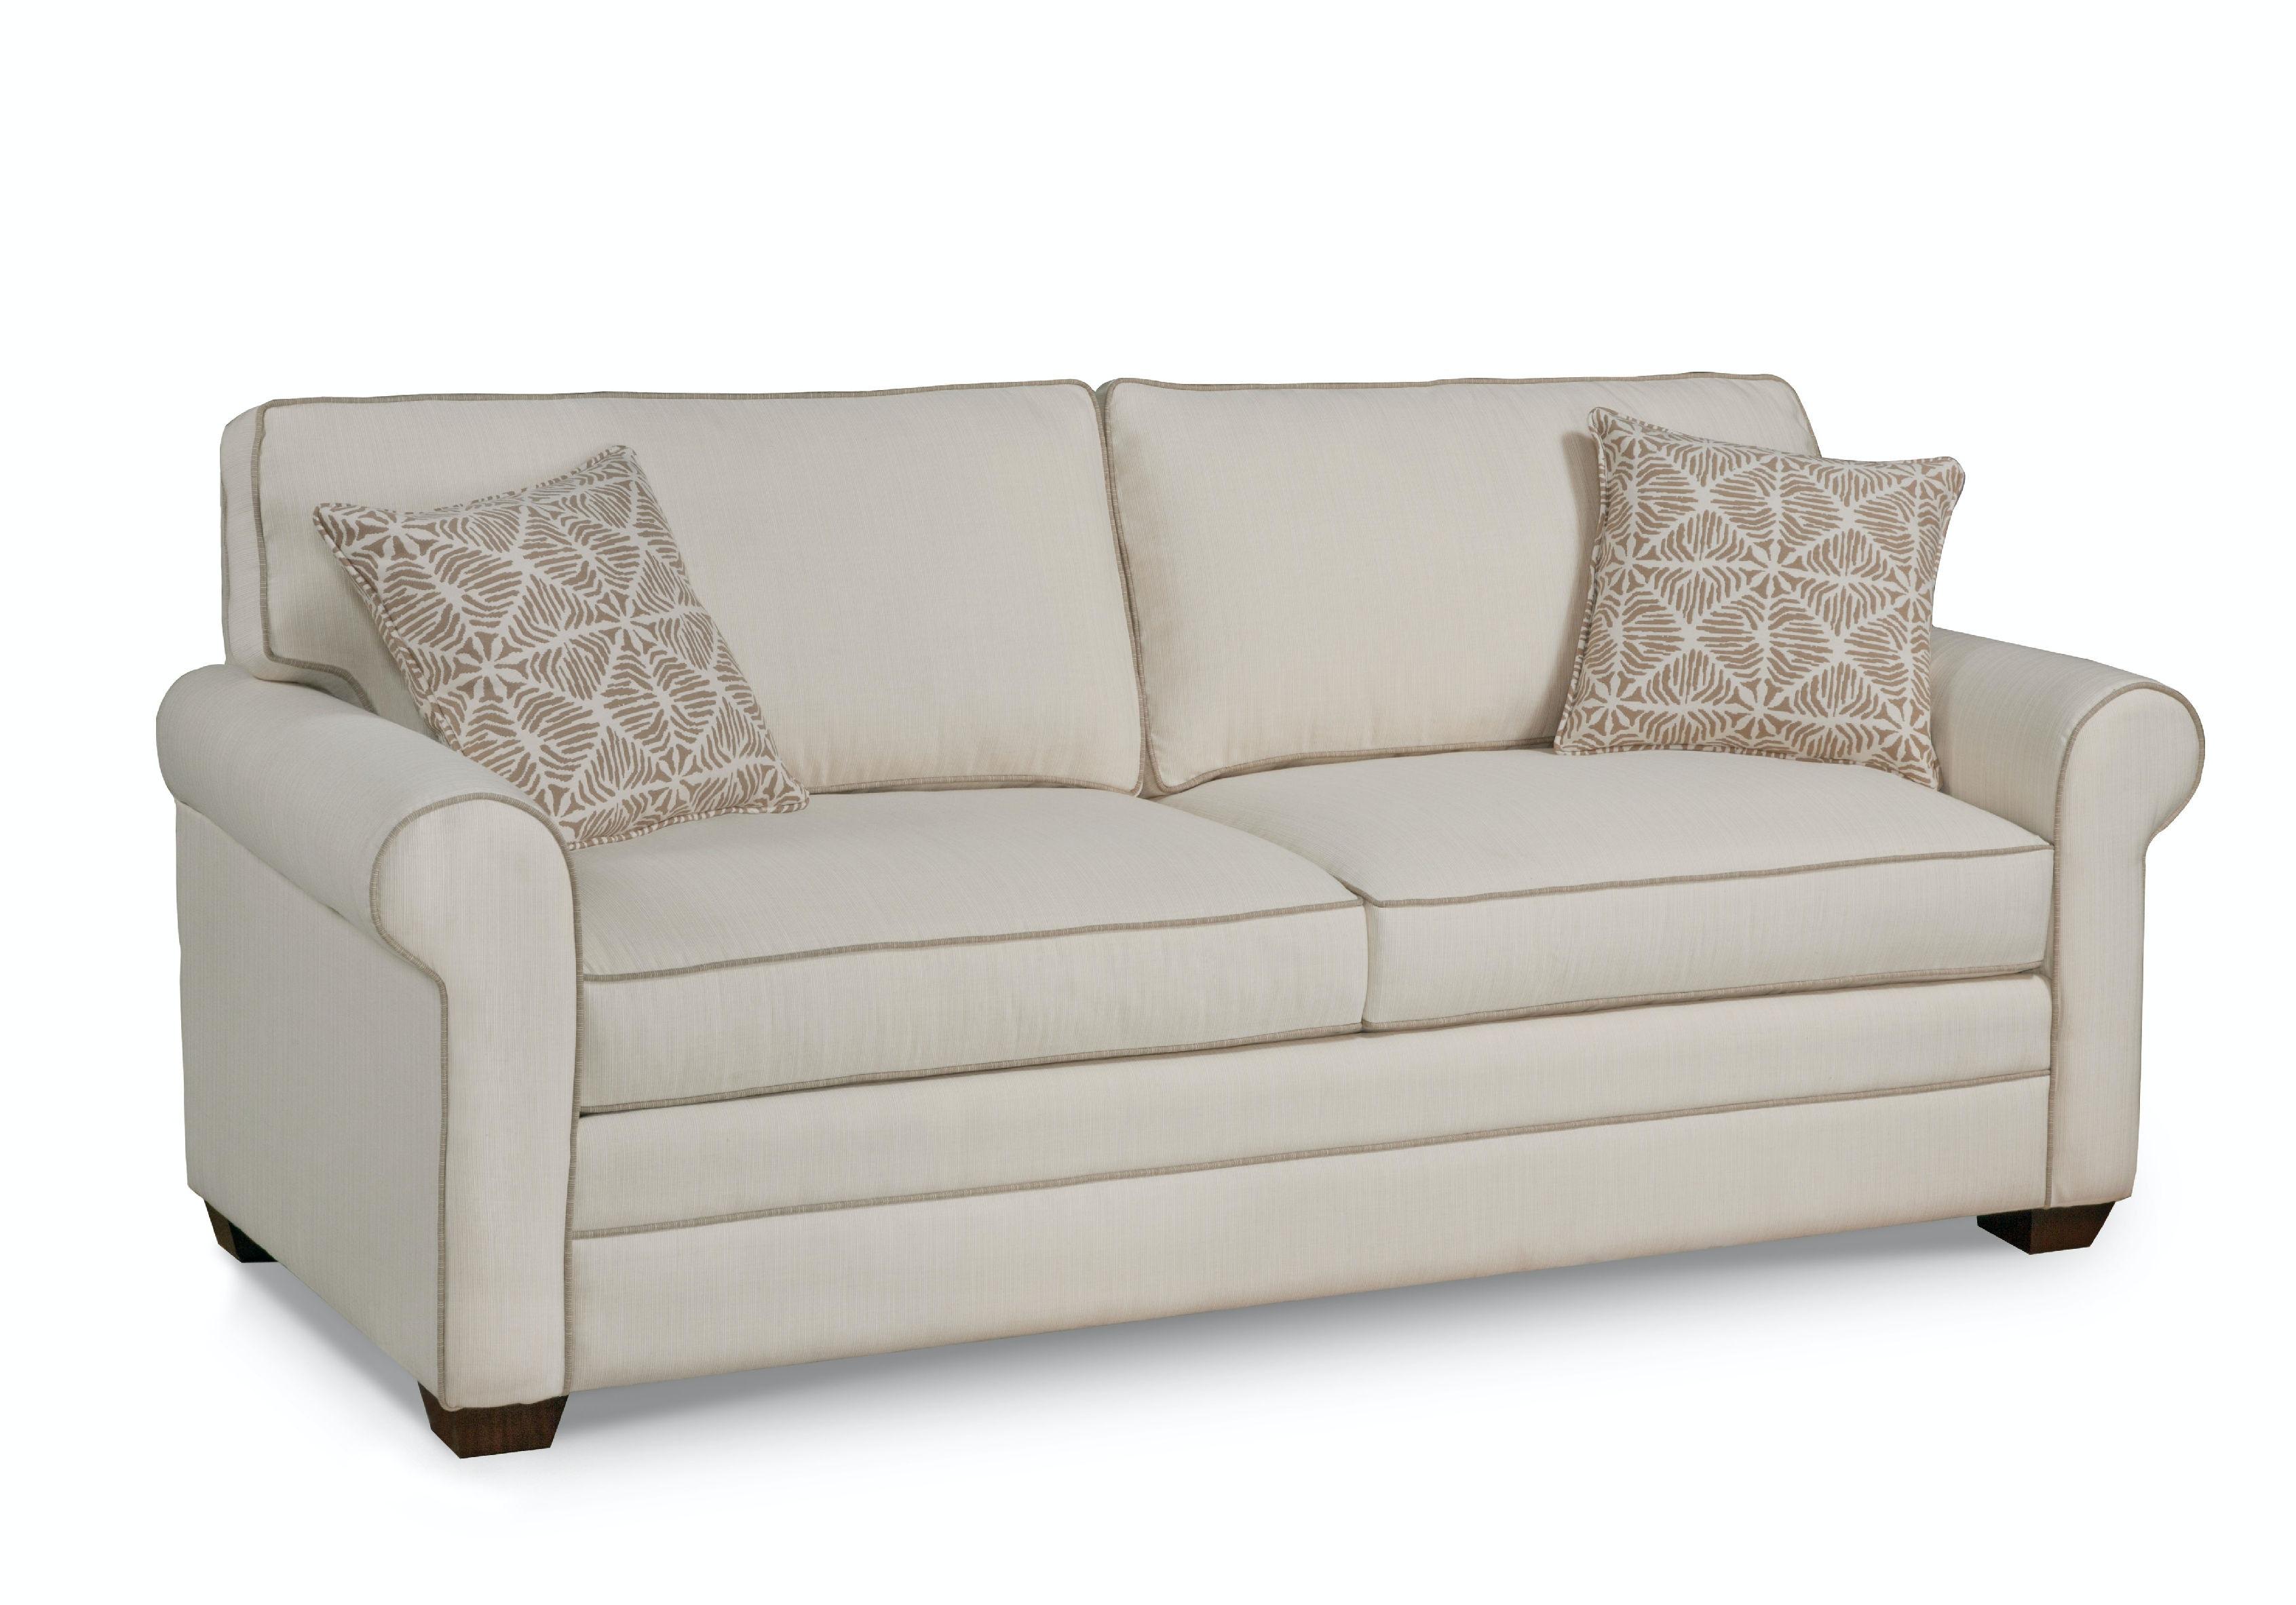 Beau 728 010. Loft Sofa